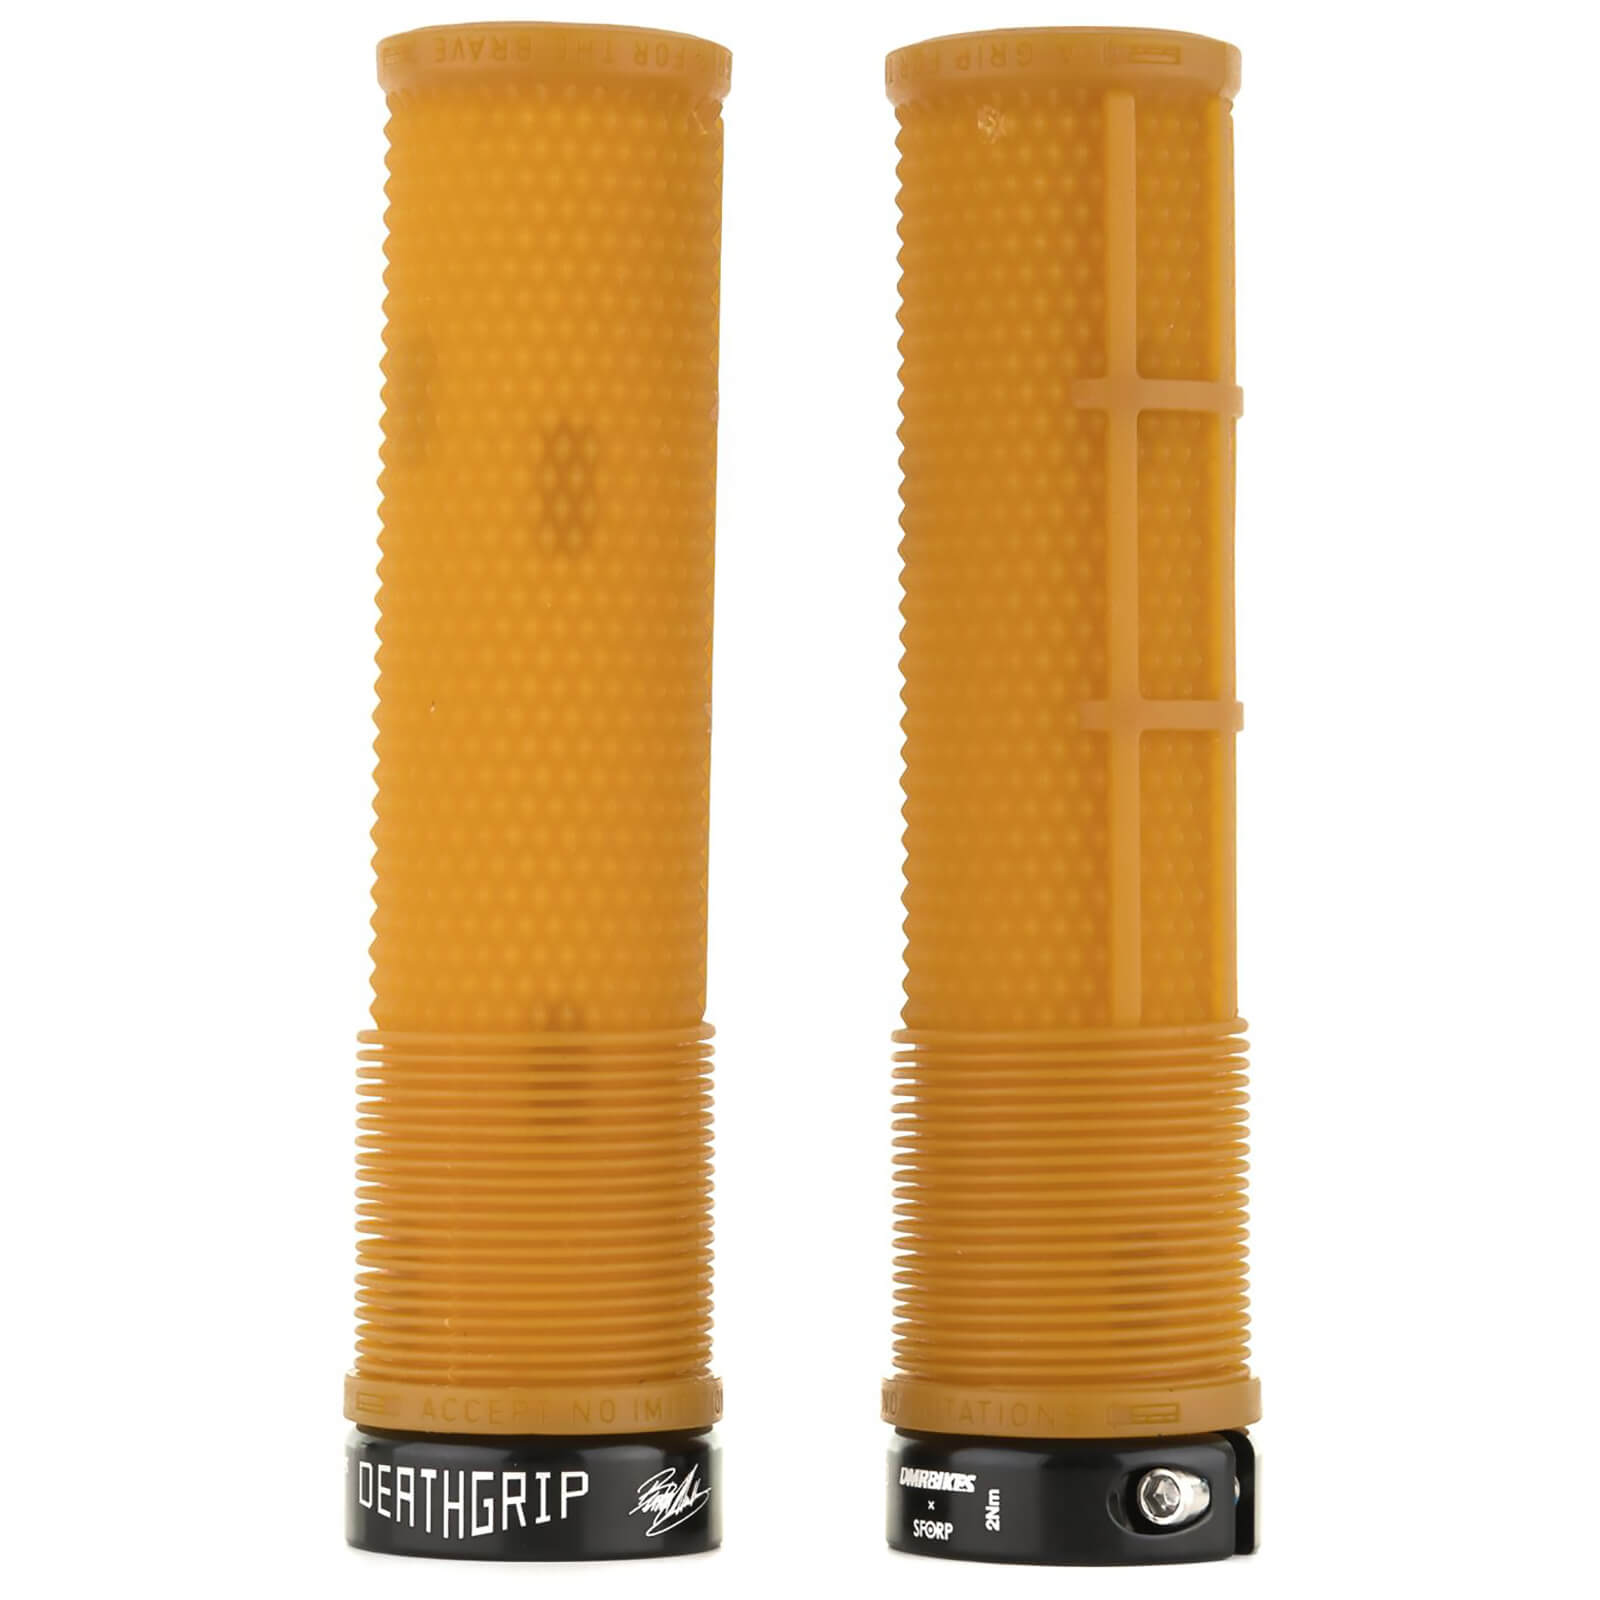 DMR Deathgrip Flangeless Handlebar Grip - Thick - 31.3mm - Gum